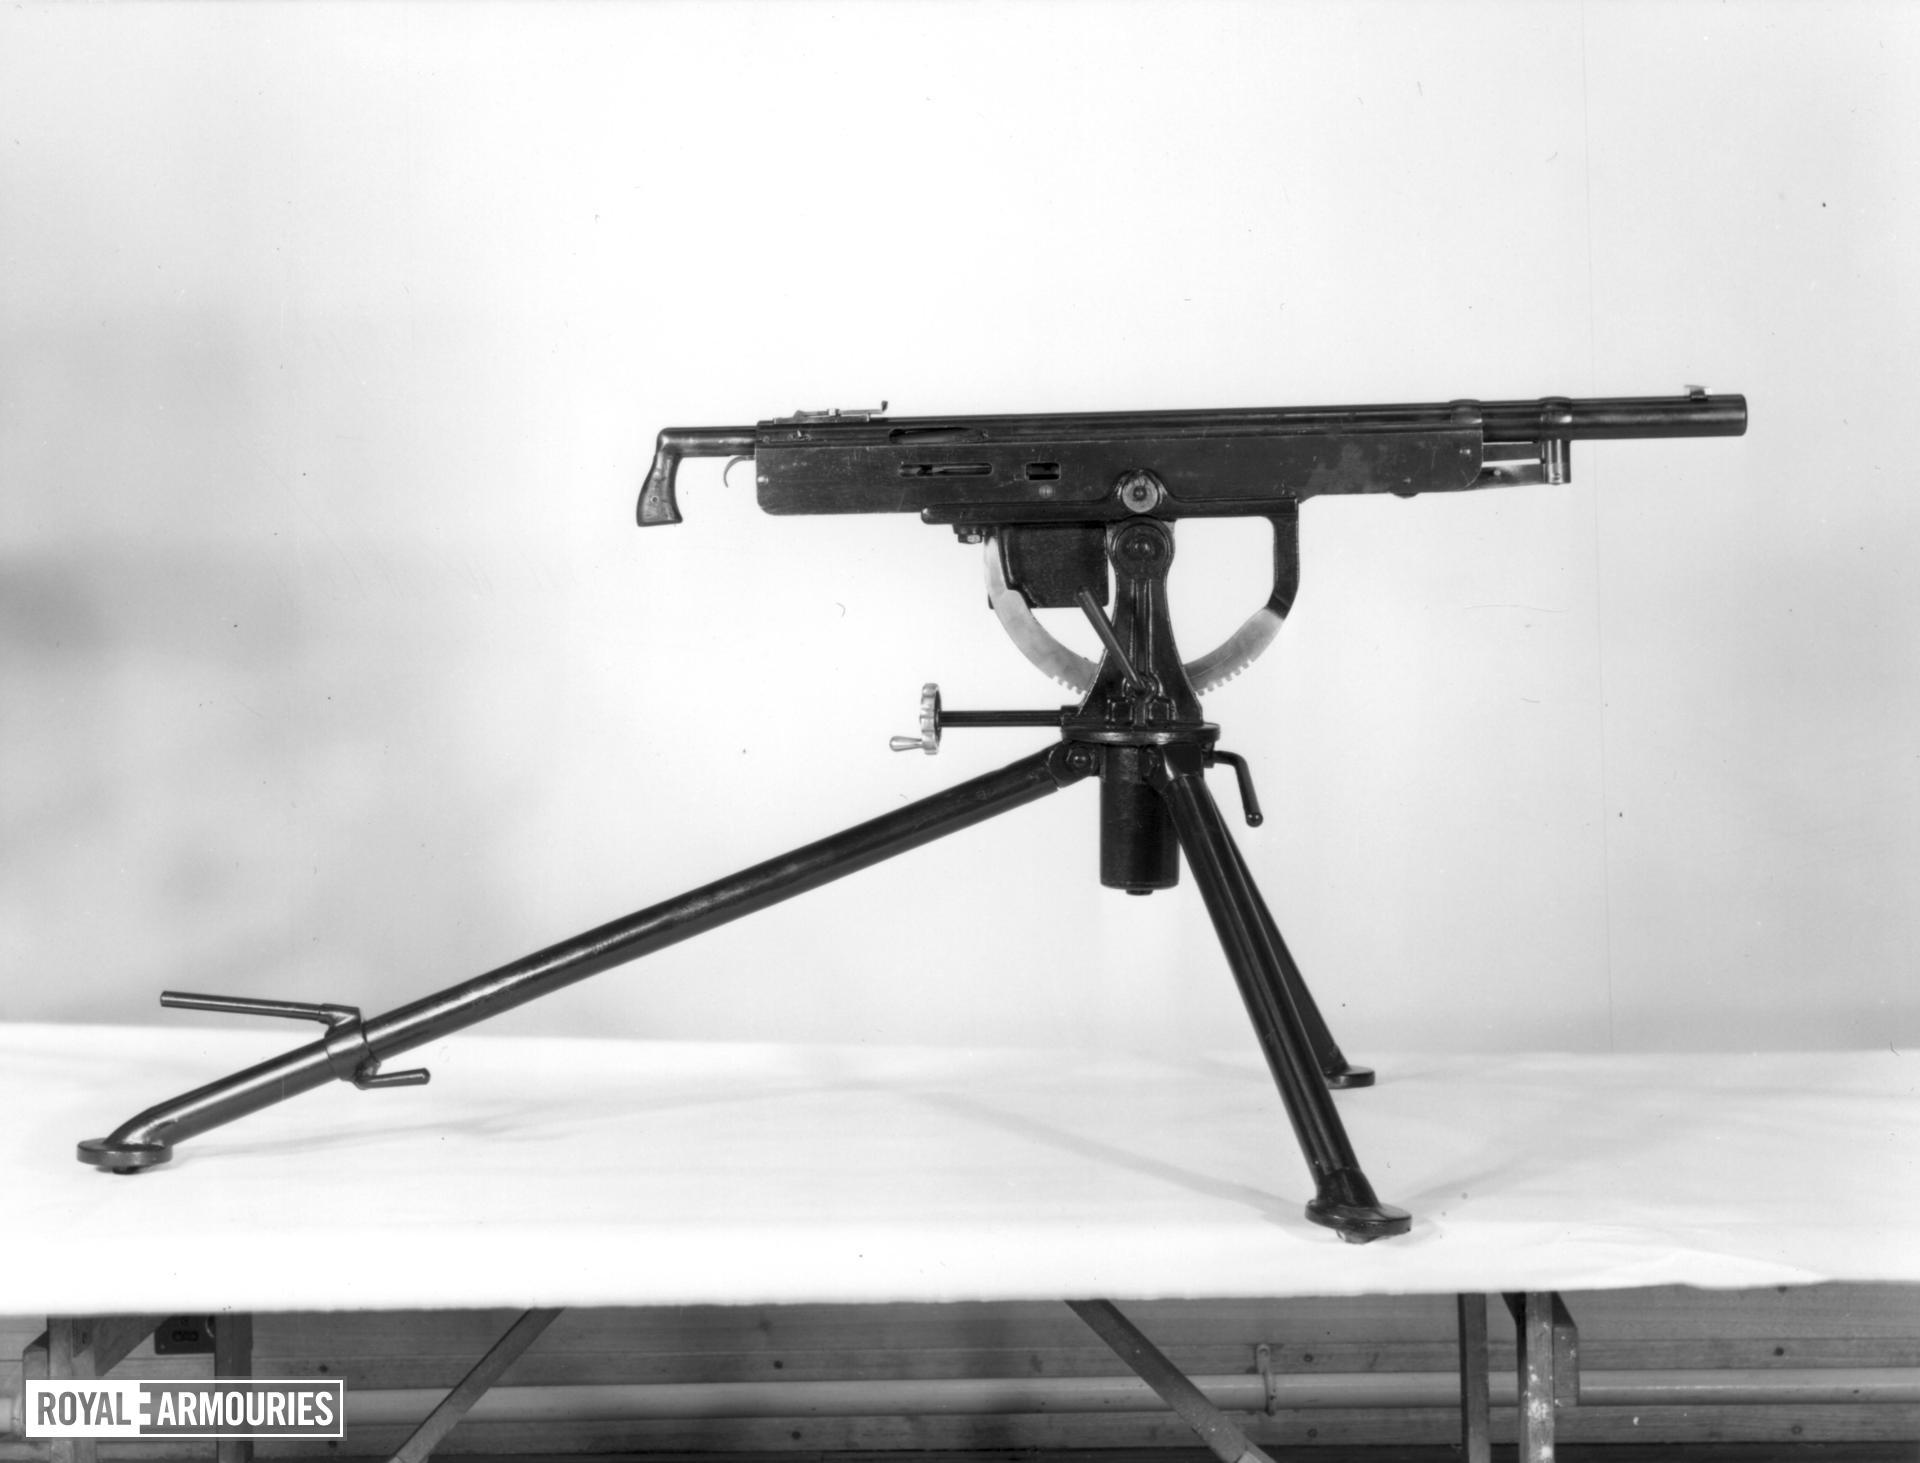 Centrefire automatic belt-fed machine gun - Colt-Browning